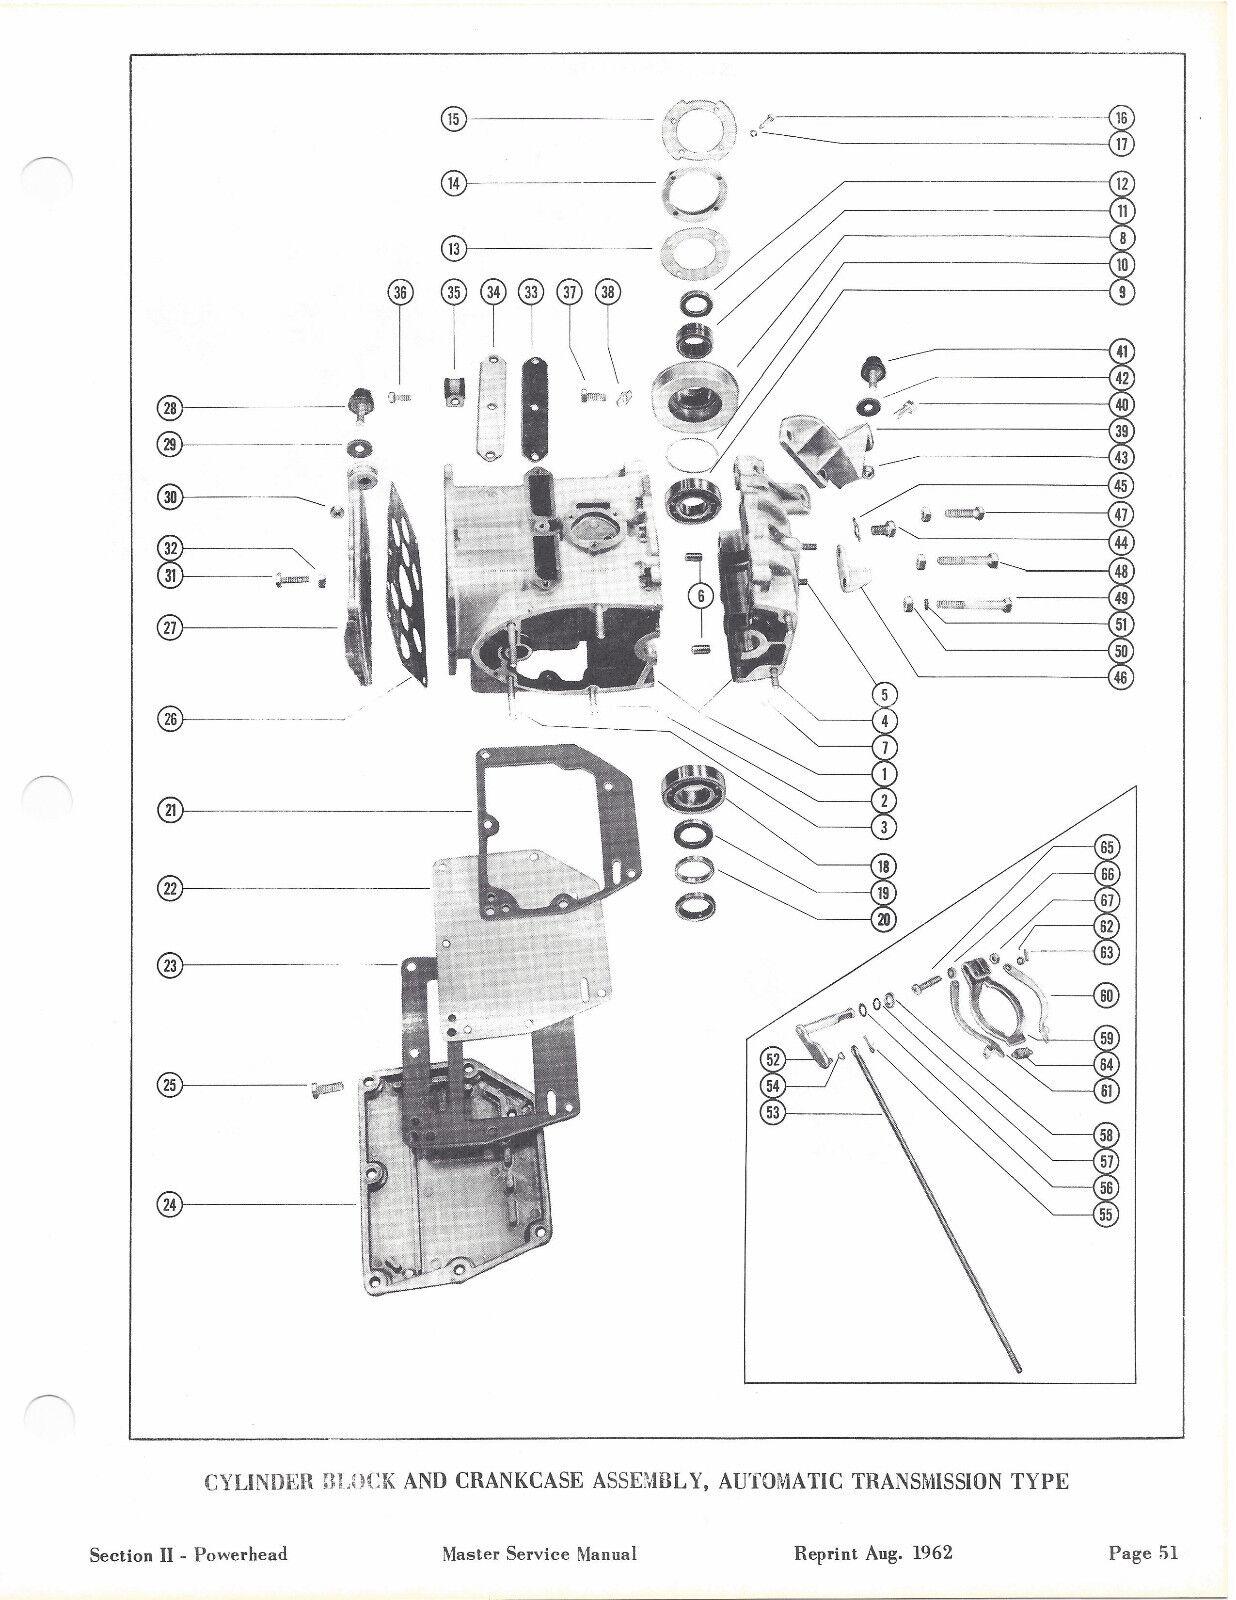 Service Manual Mercury Mark 10 One Word Quickstart Guide Book 75 Hp Mariner Outboard Wiring Diagram 10a 15a Motor 1957 1958 17 Rh Picclick Com Parts